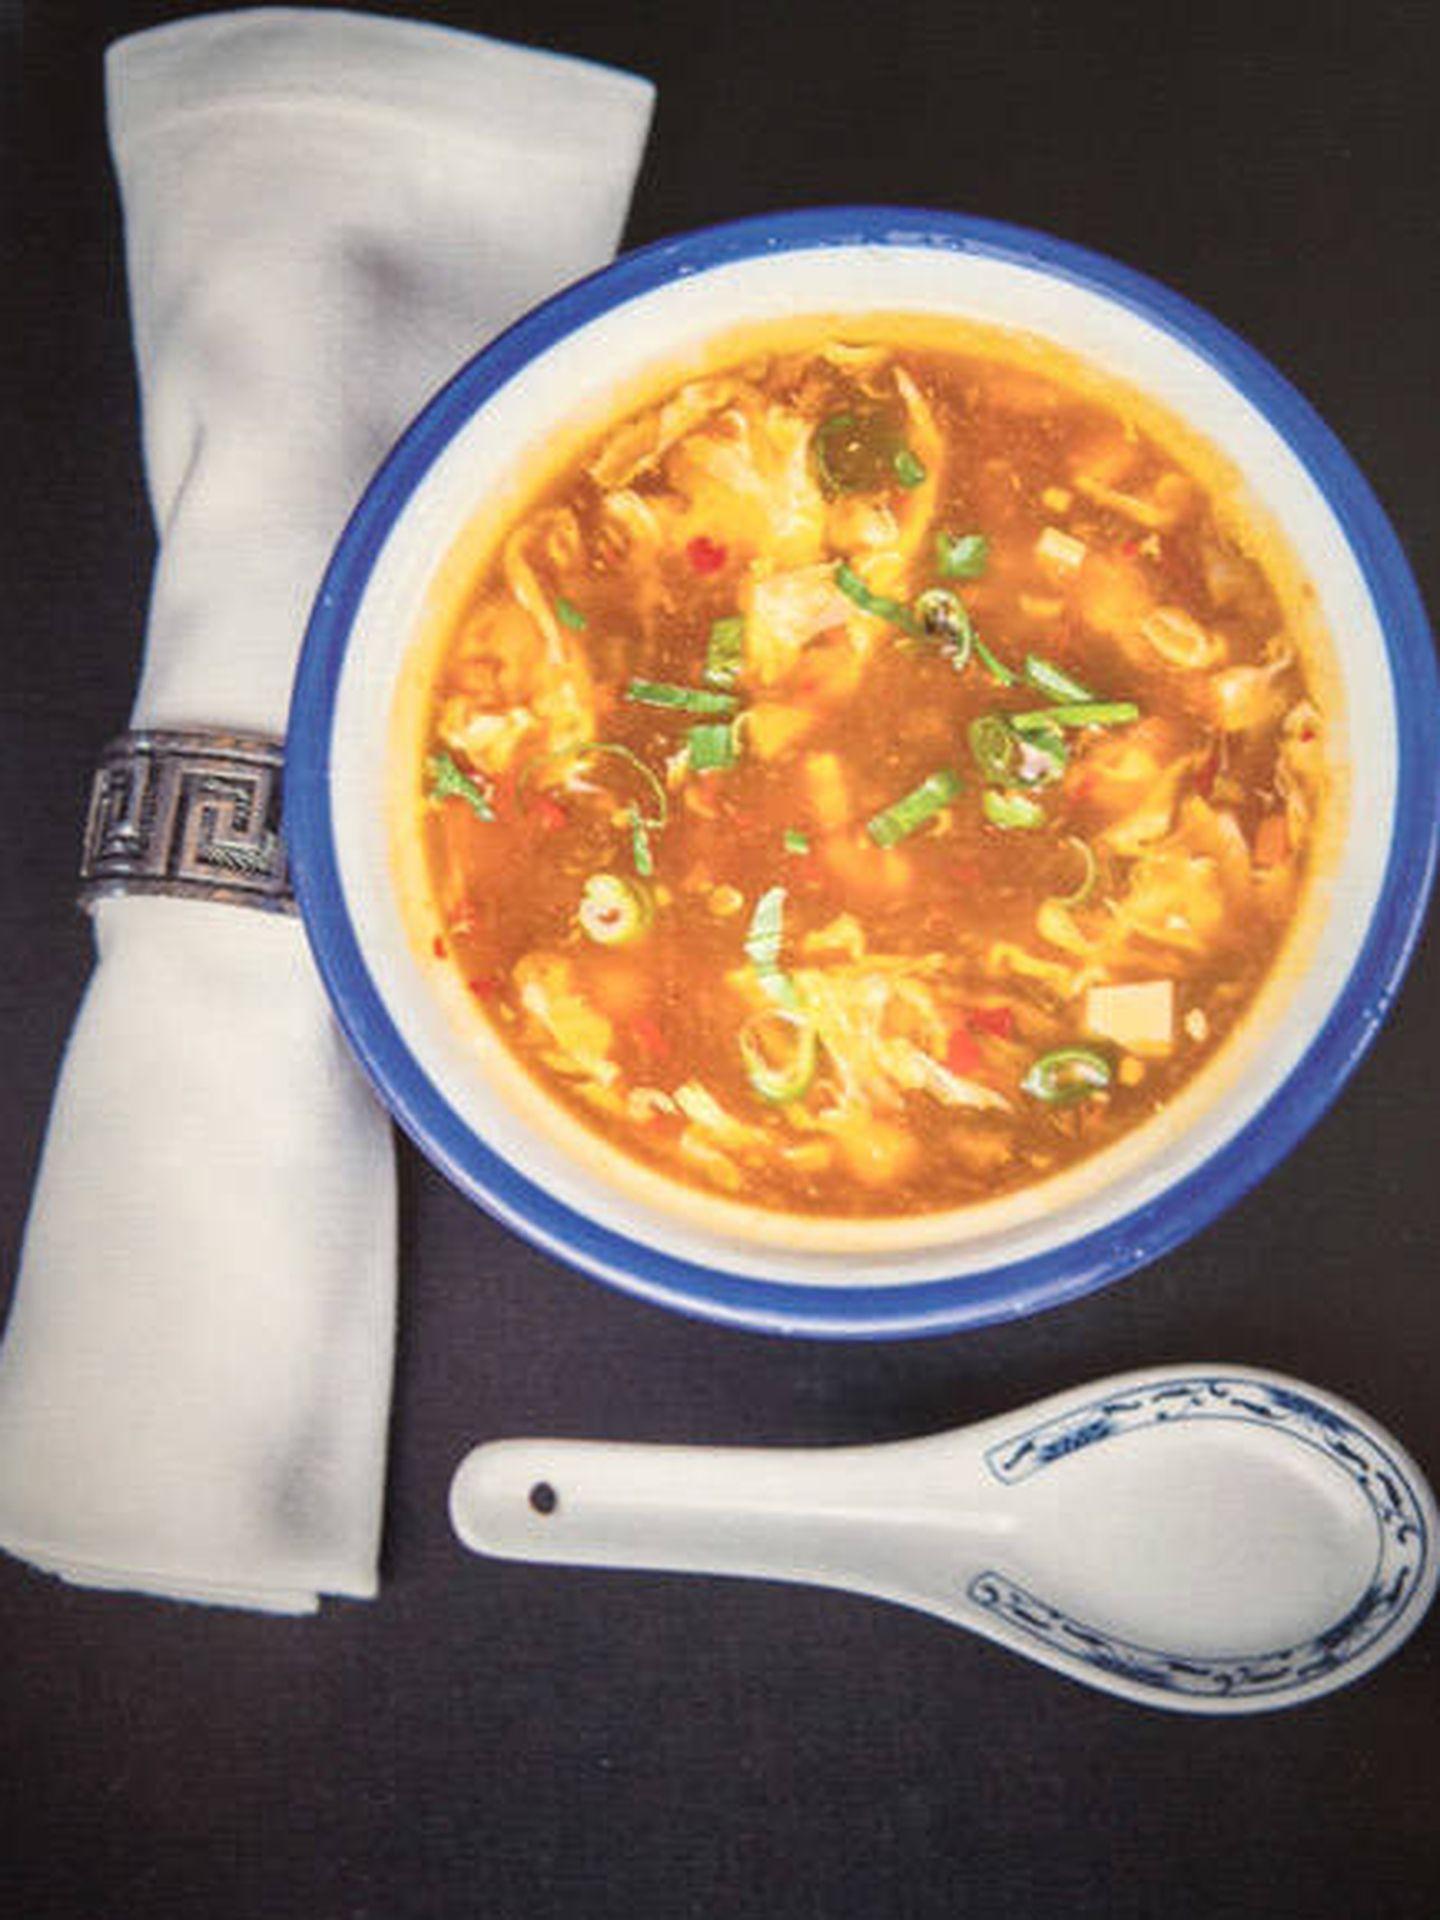 La sopa agripicante de Kanbun.